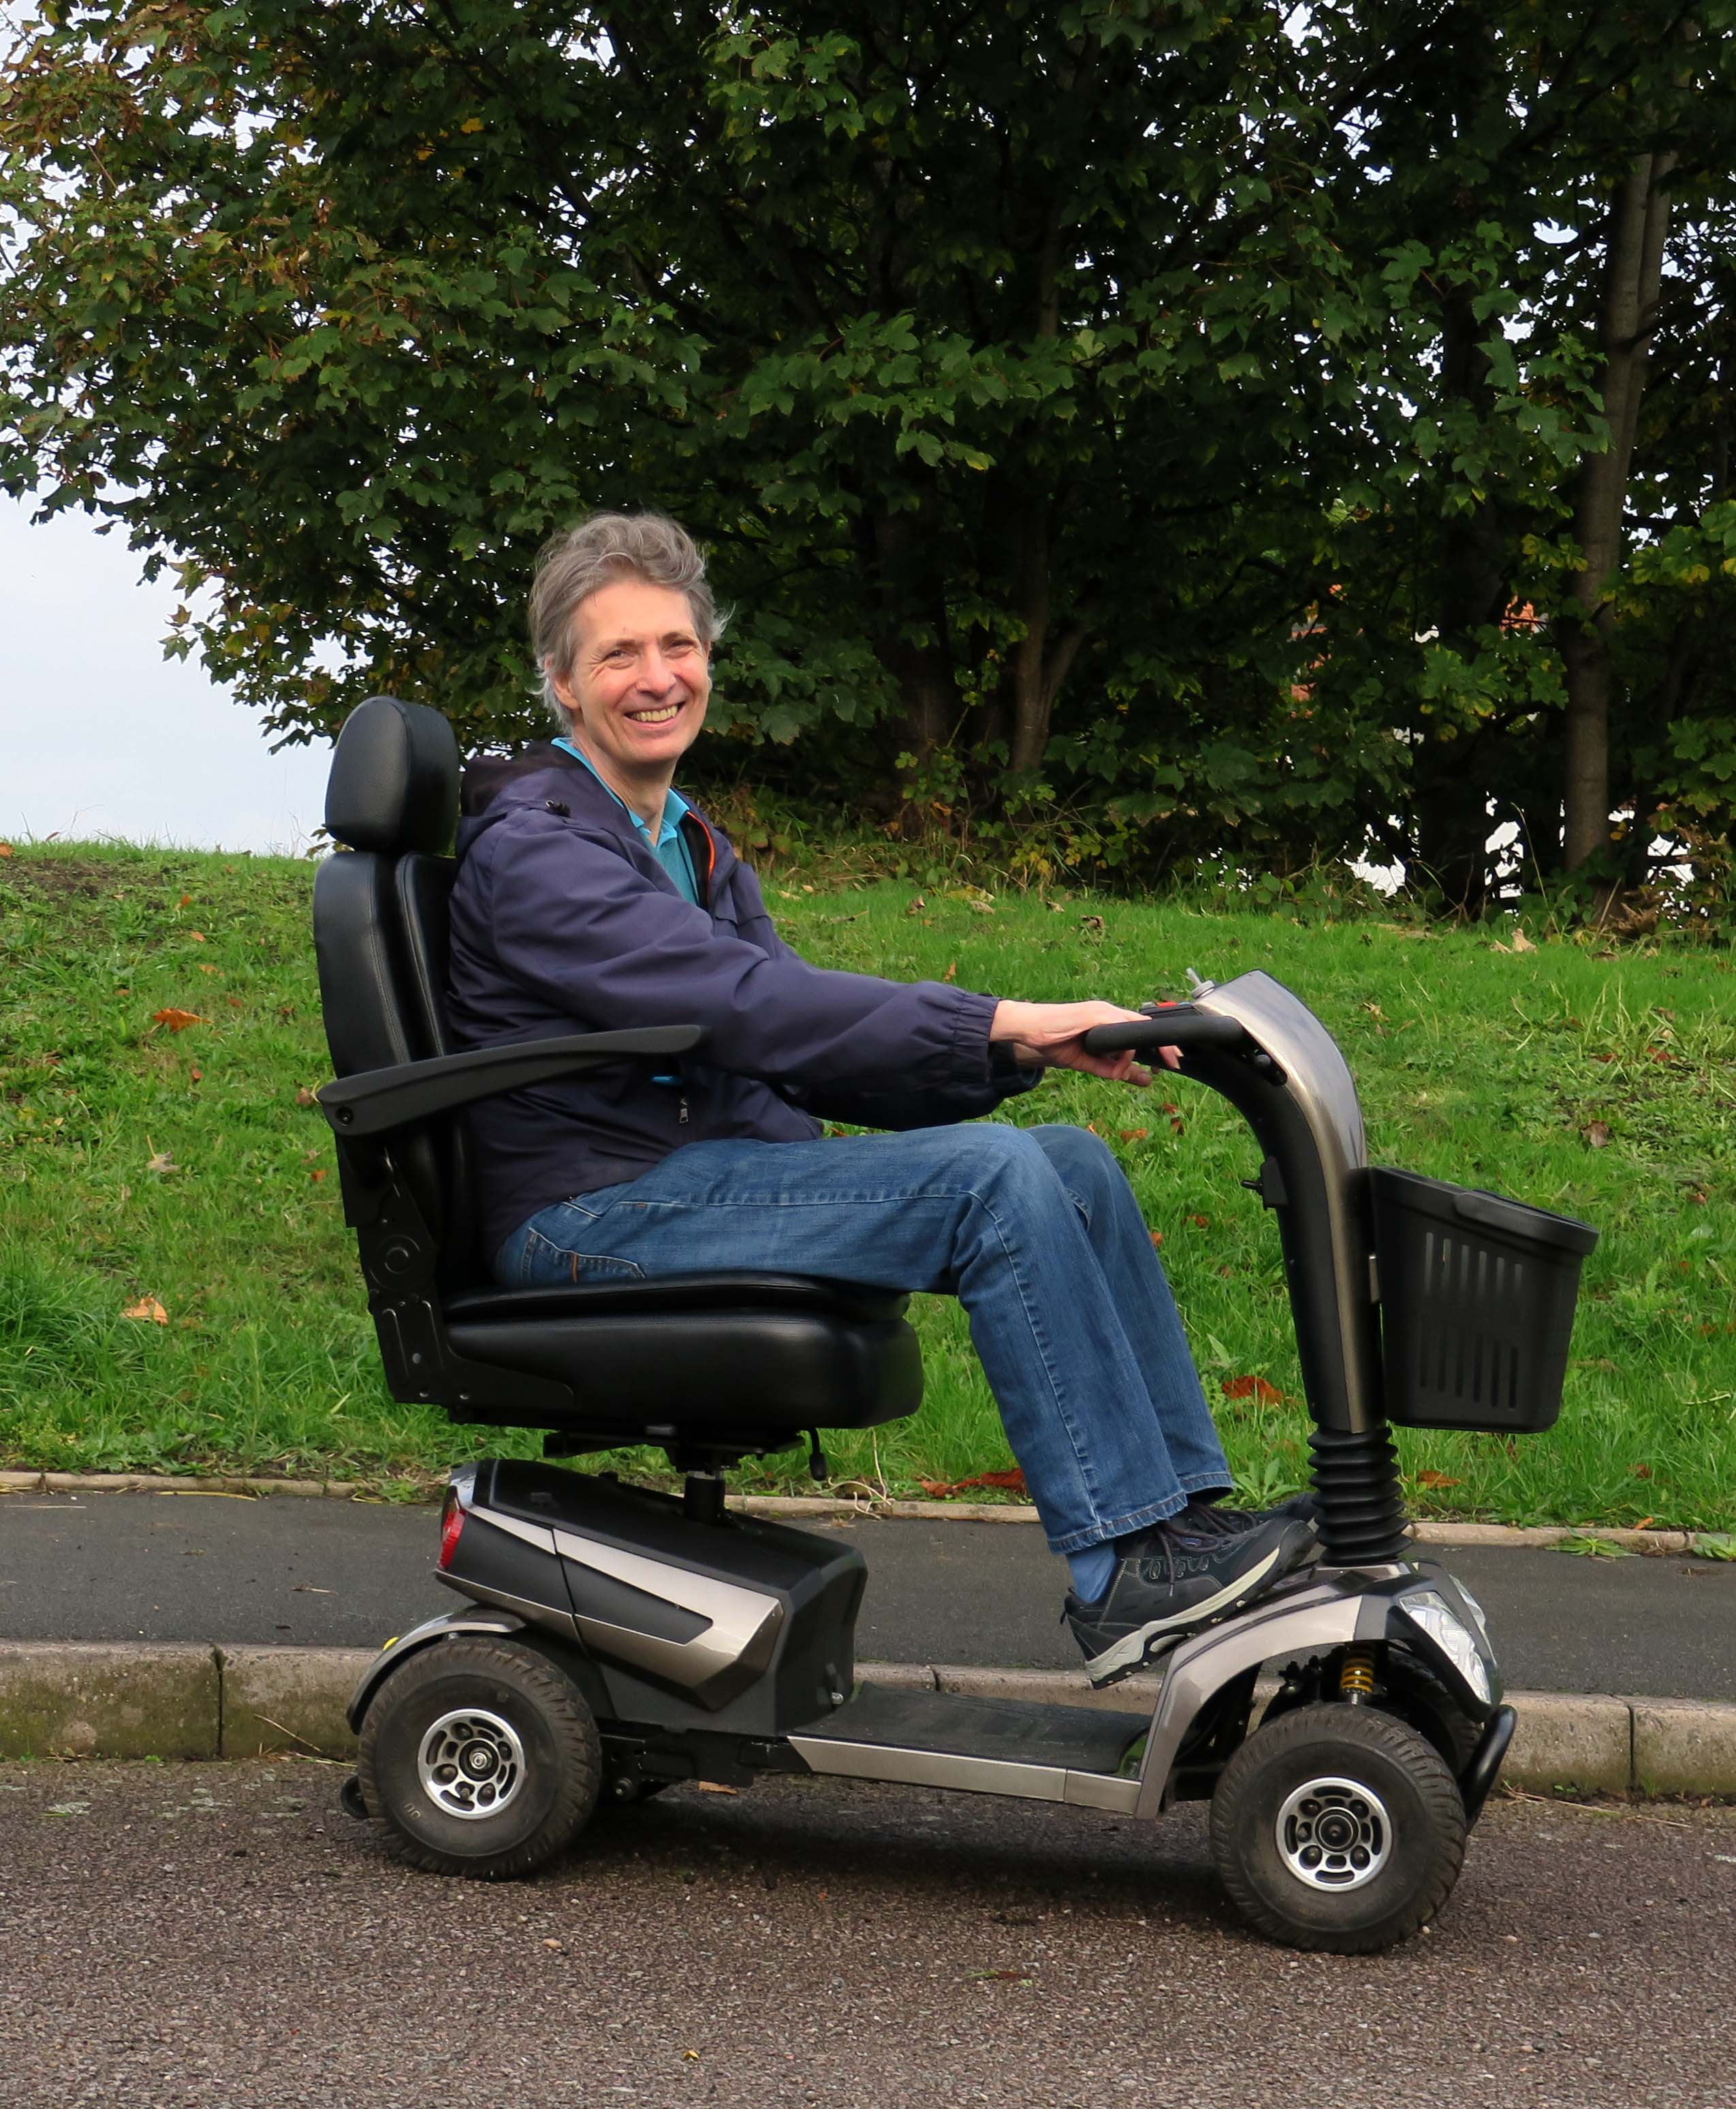 One Rehab Komfi Rider Liberator, weekly rental £23.76